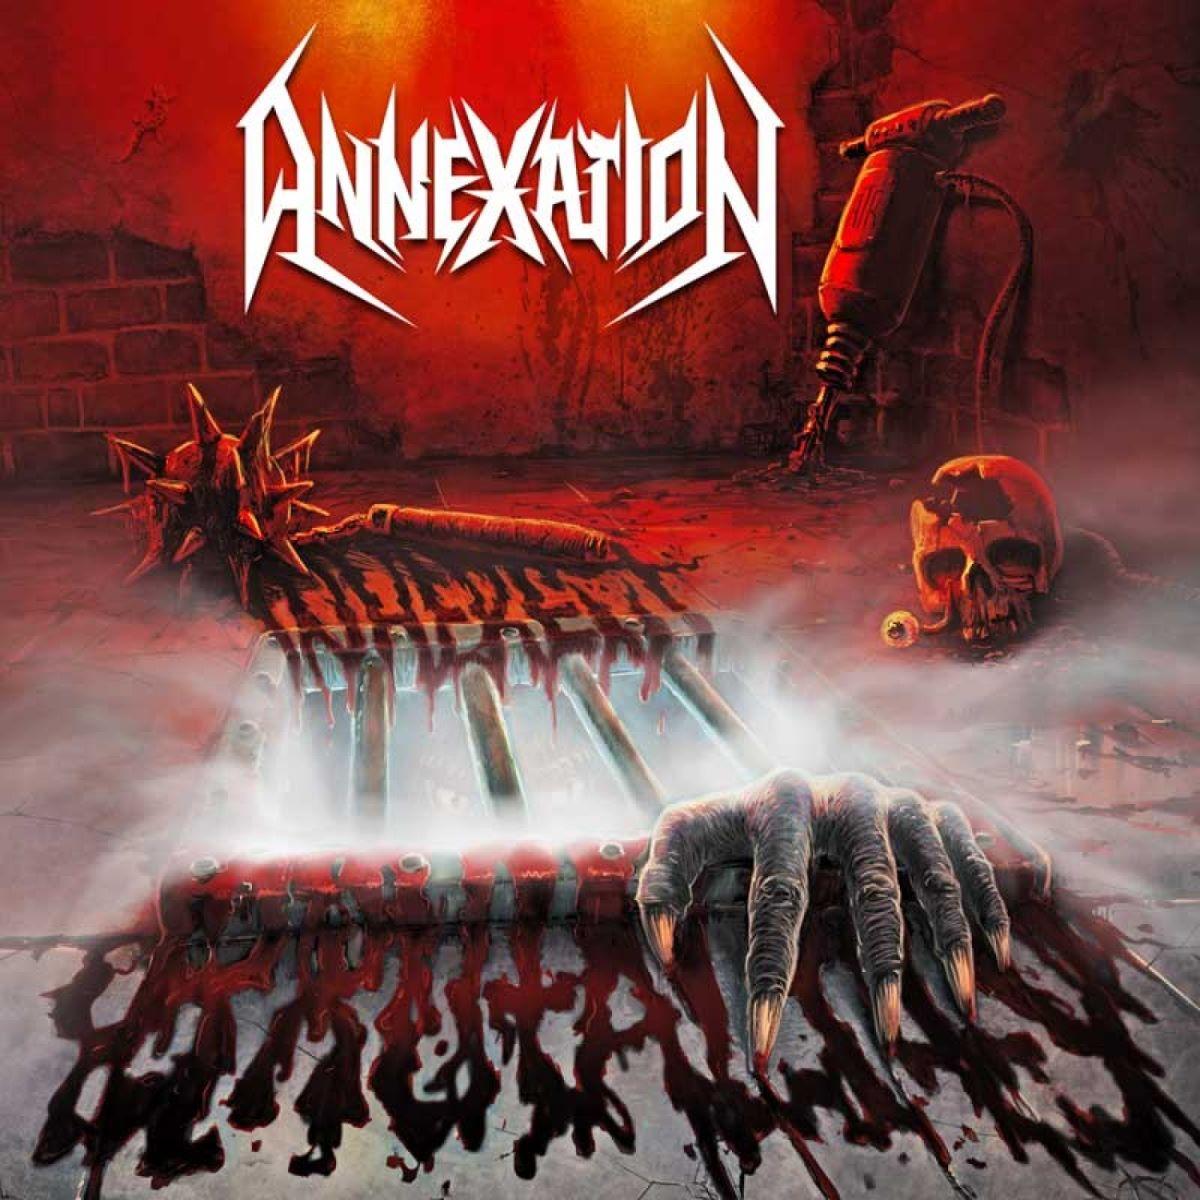 ANNEXATION - Inherent Brutality - album cover